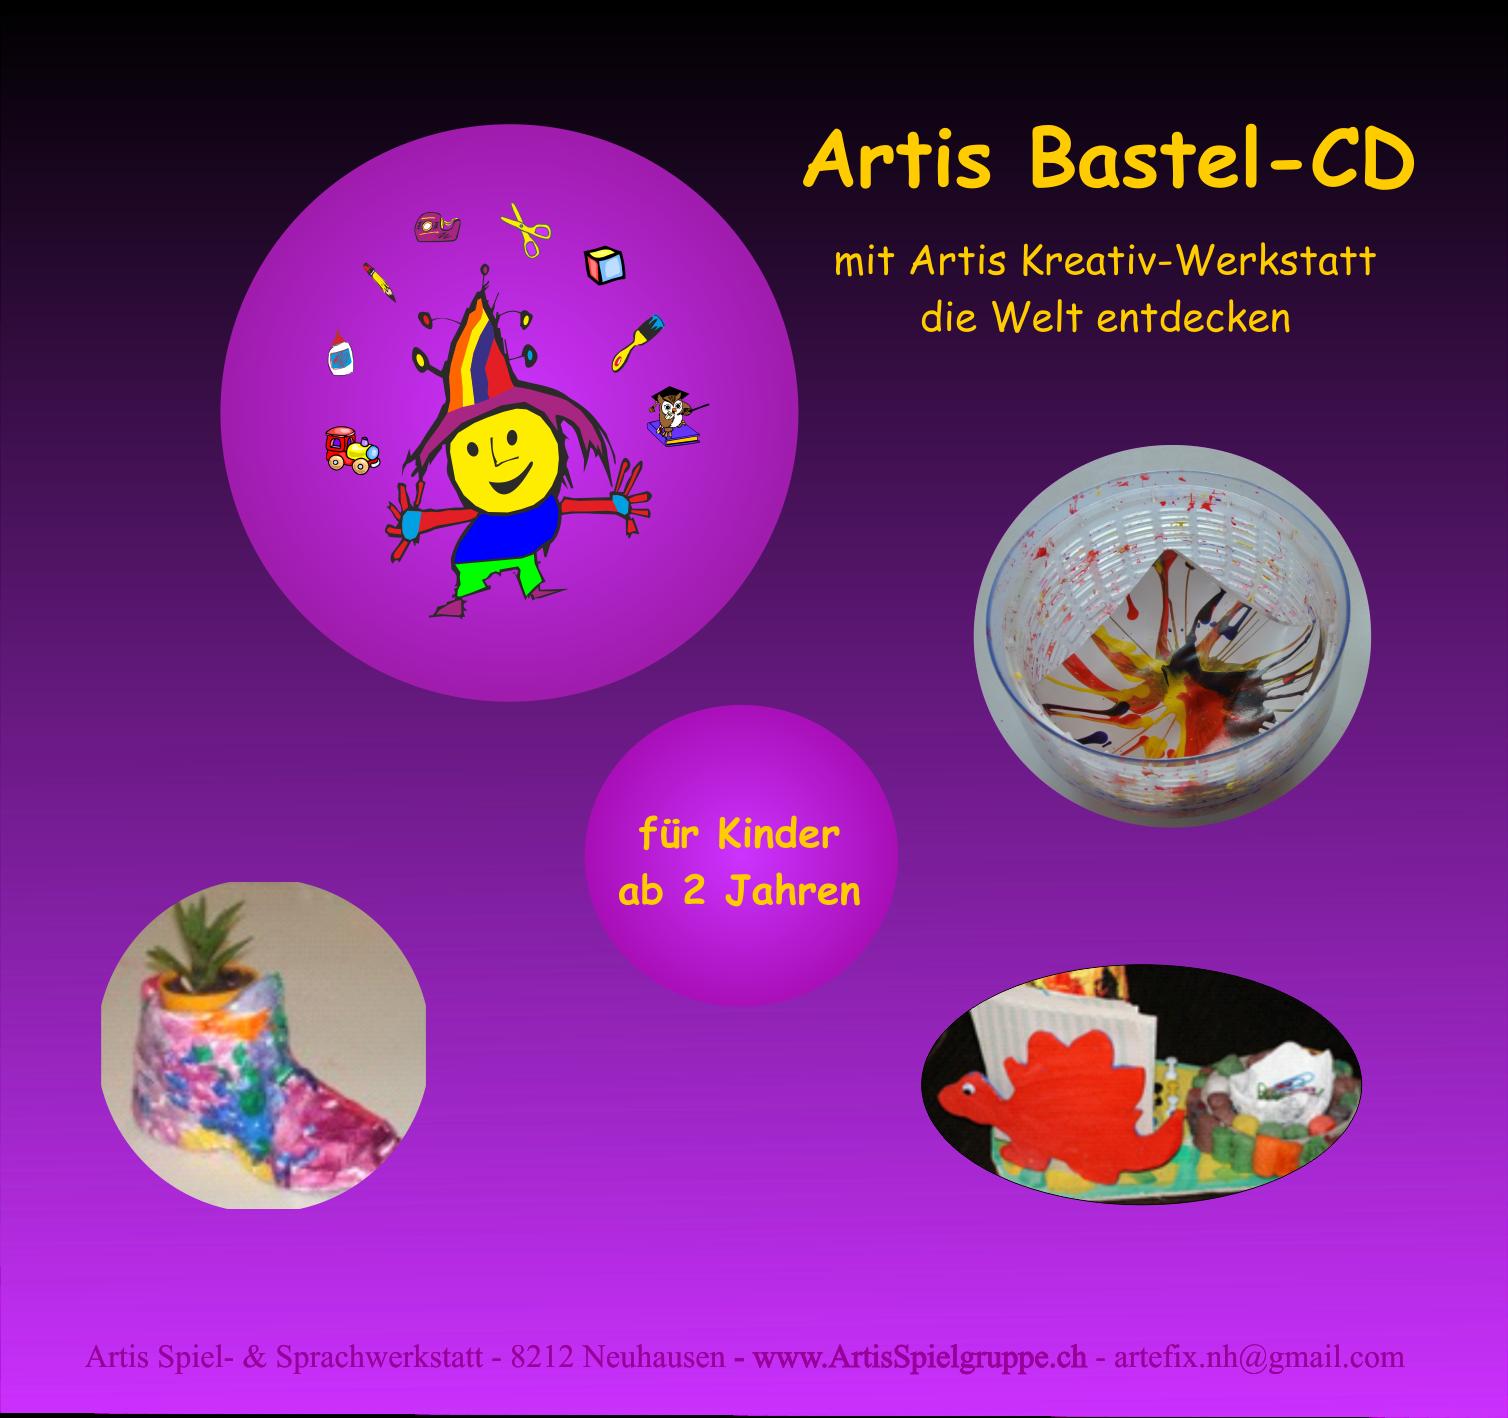 Artis Kreativ-Werkstatt